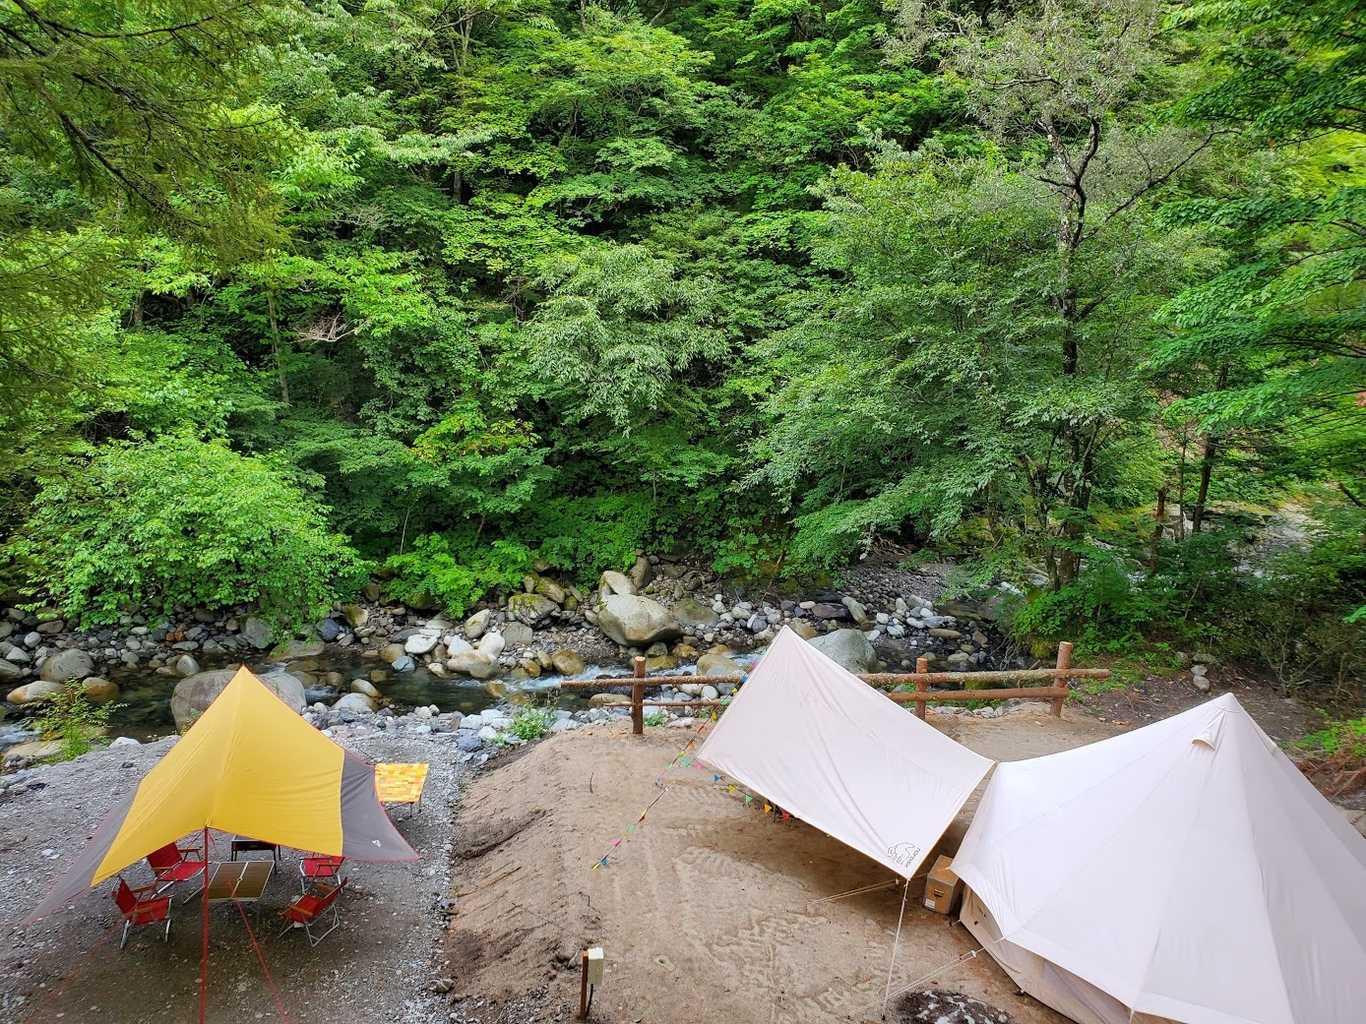 RIVER-Side【グロッケ24】手ぶらキャンププラン 画像